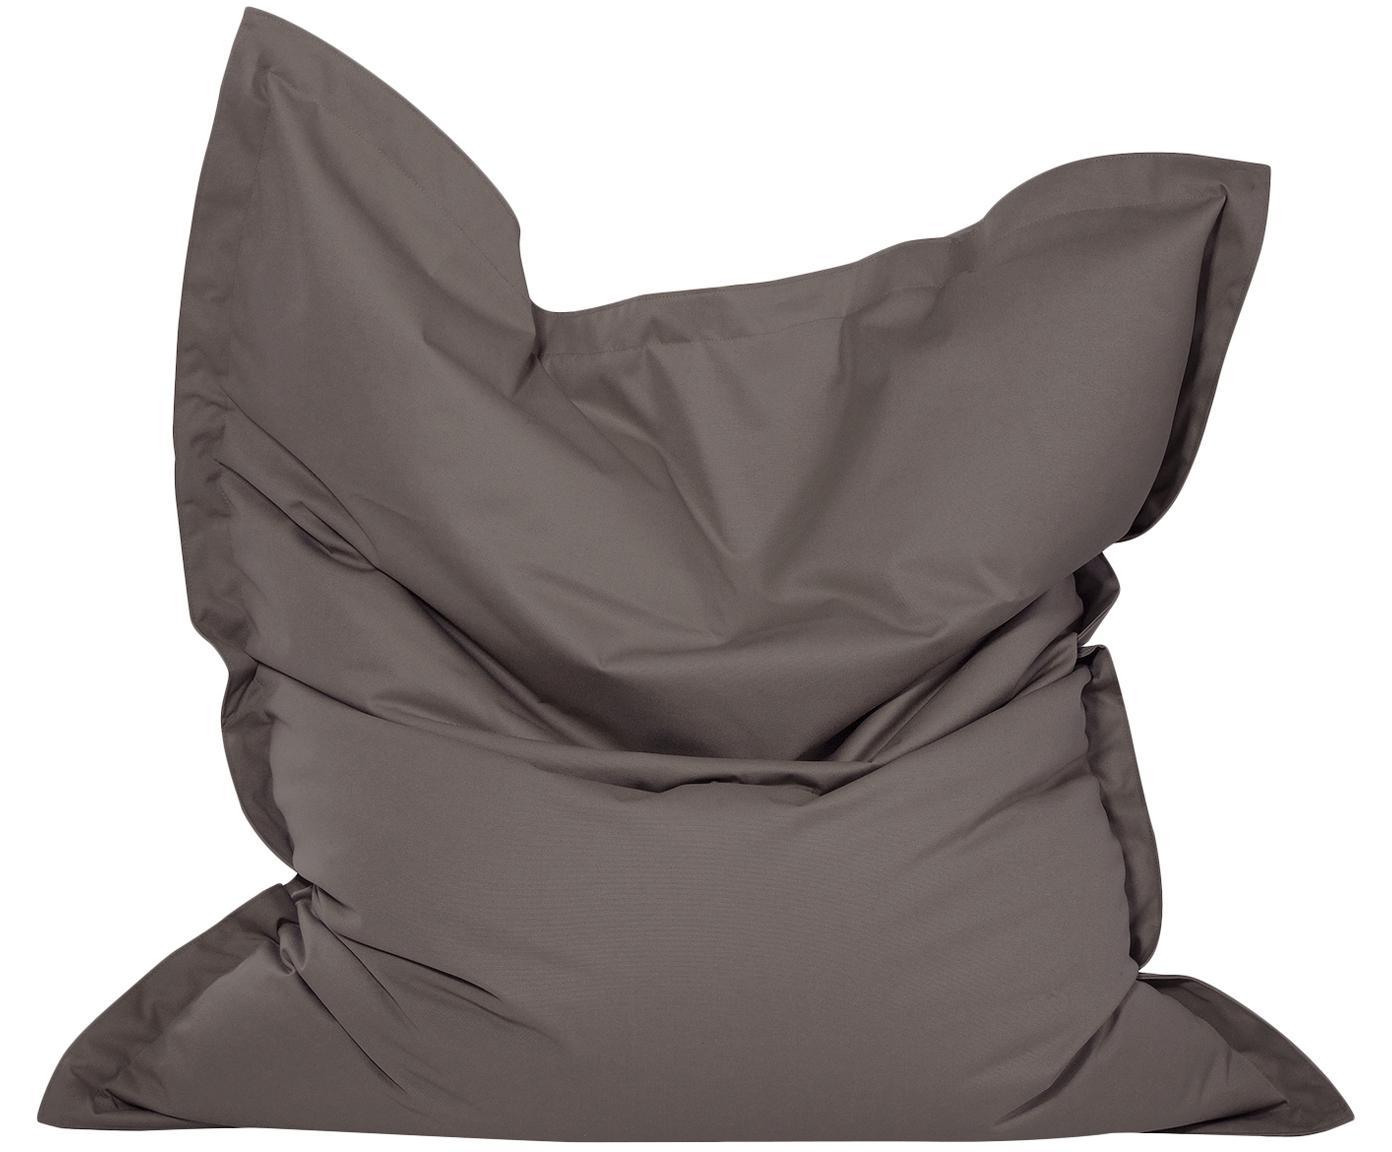 Großer Sitzsack Meadow, Bezug: Polyester, polyurethanbes, Anthrazit, 130 x 160 cm